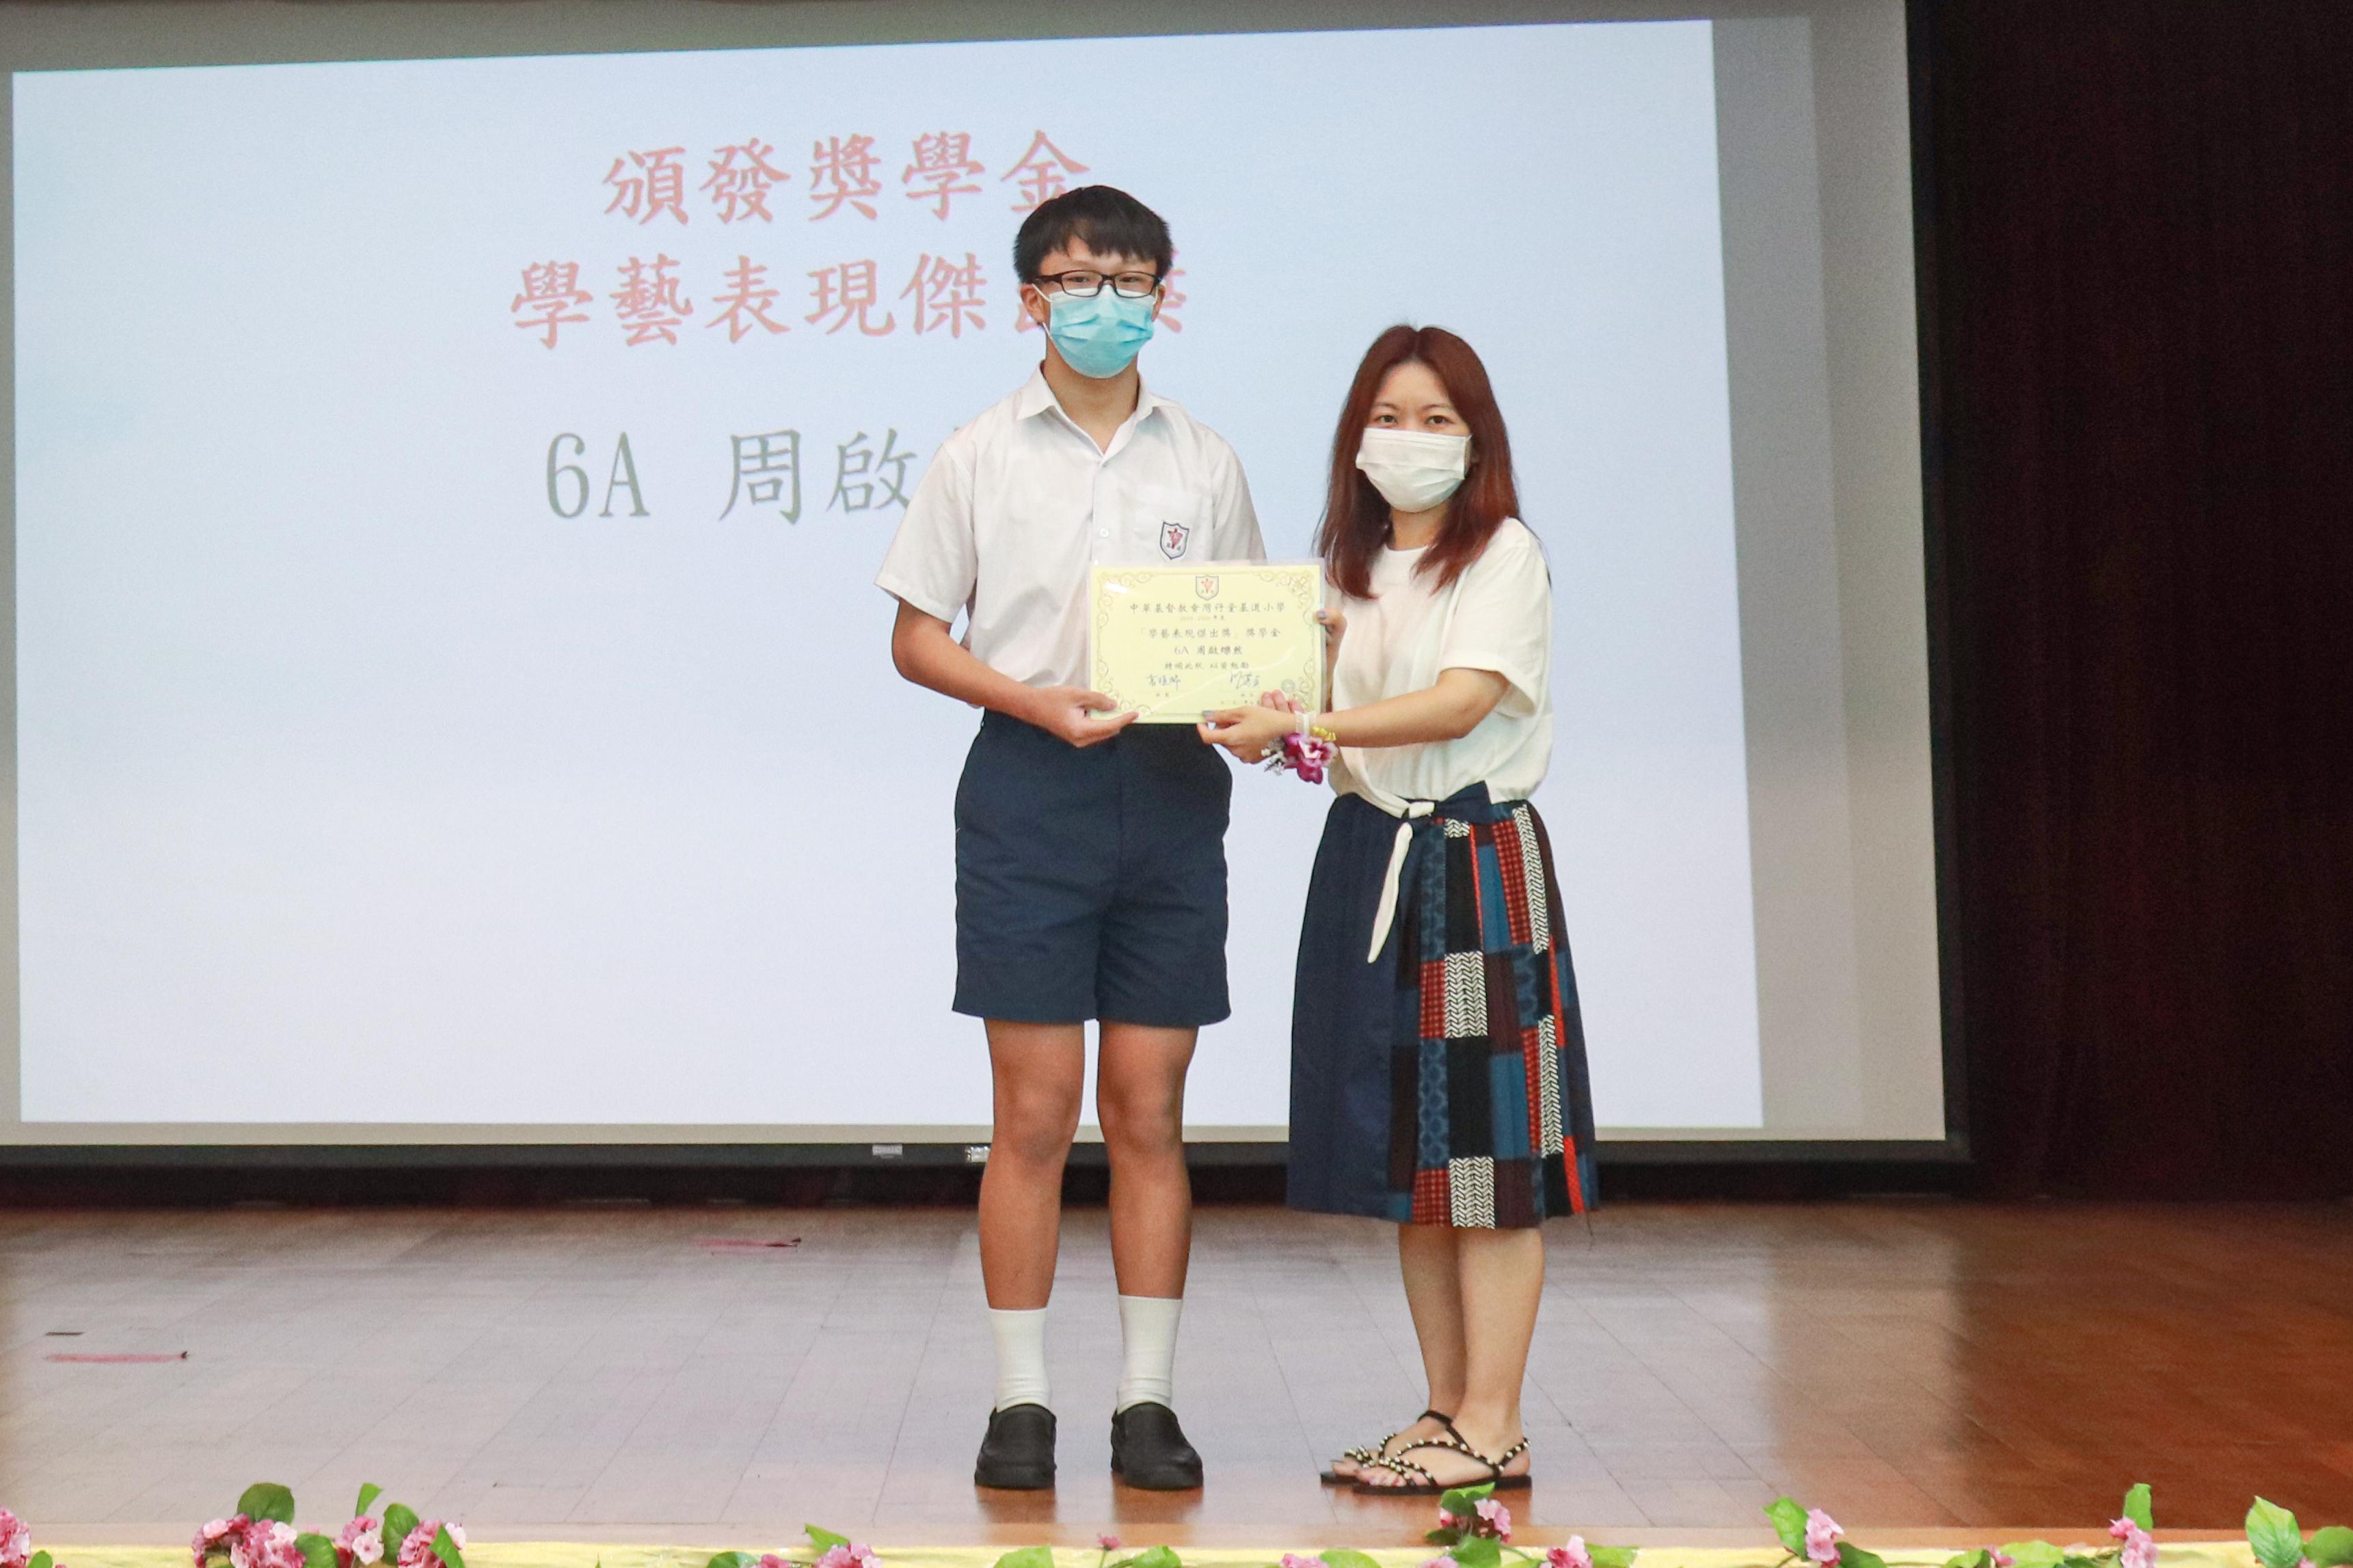 http://keito.school.hk/sites/default/files/img_5781.jpg